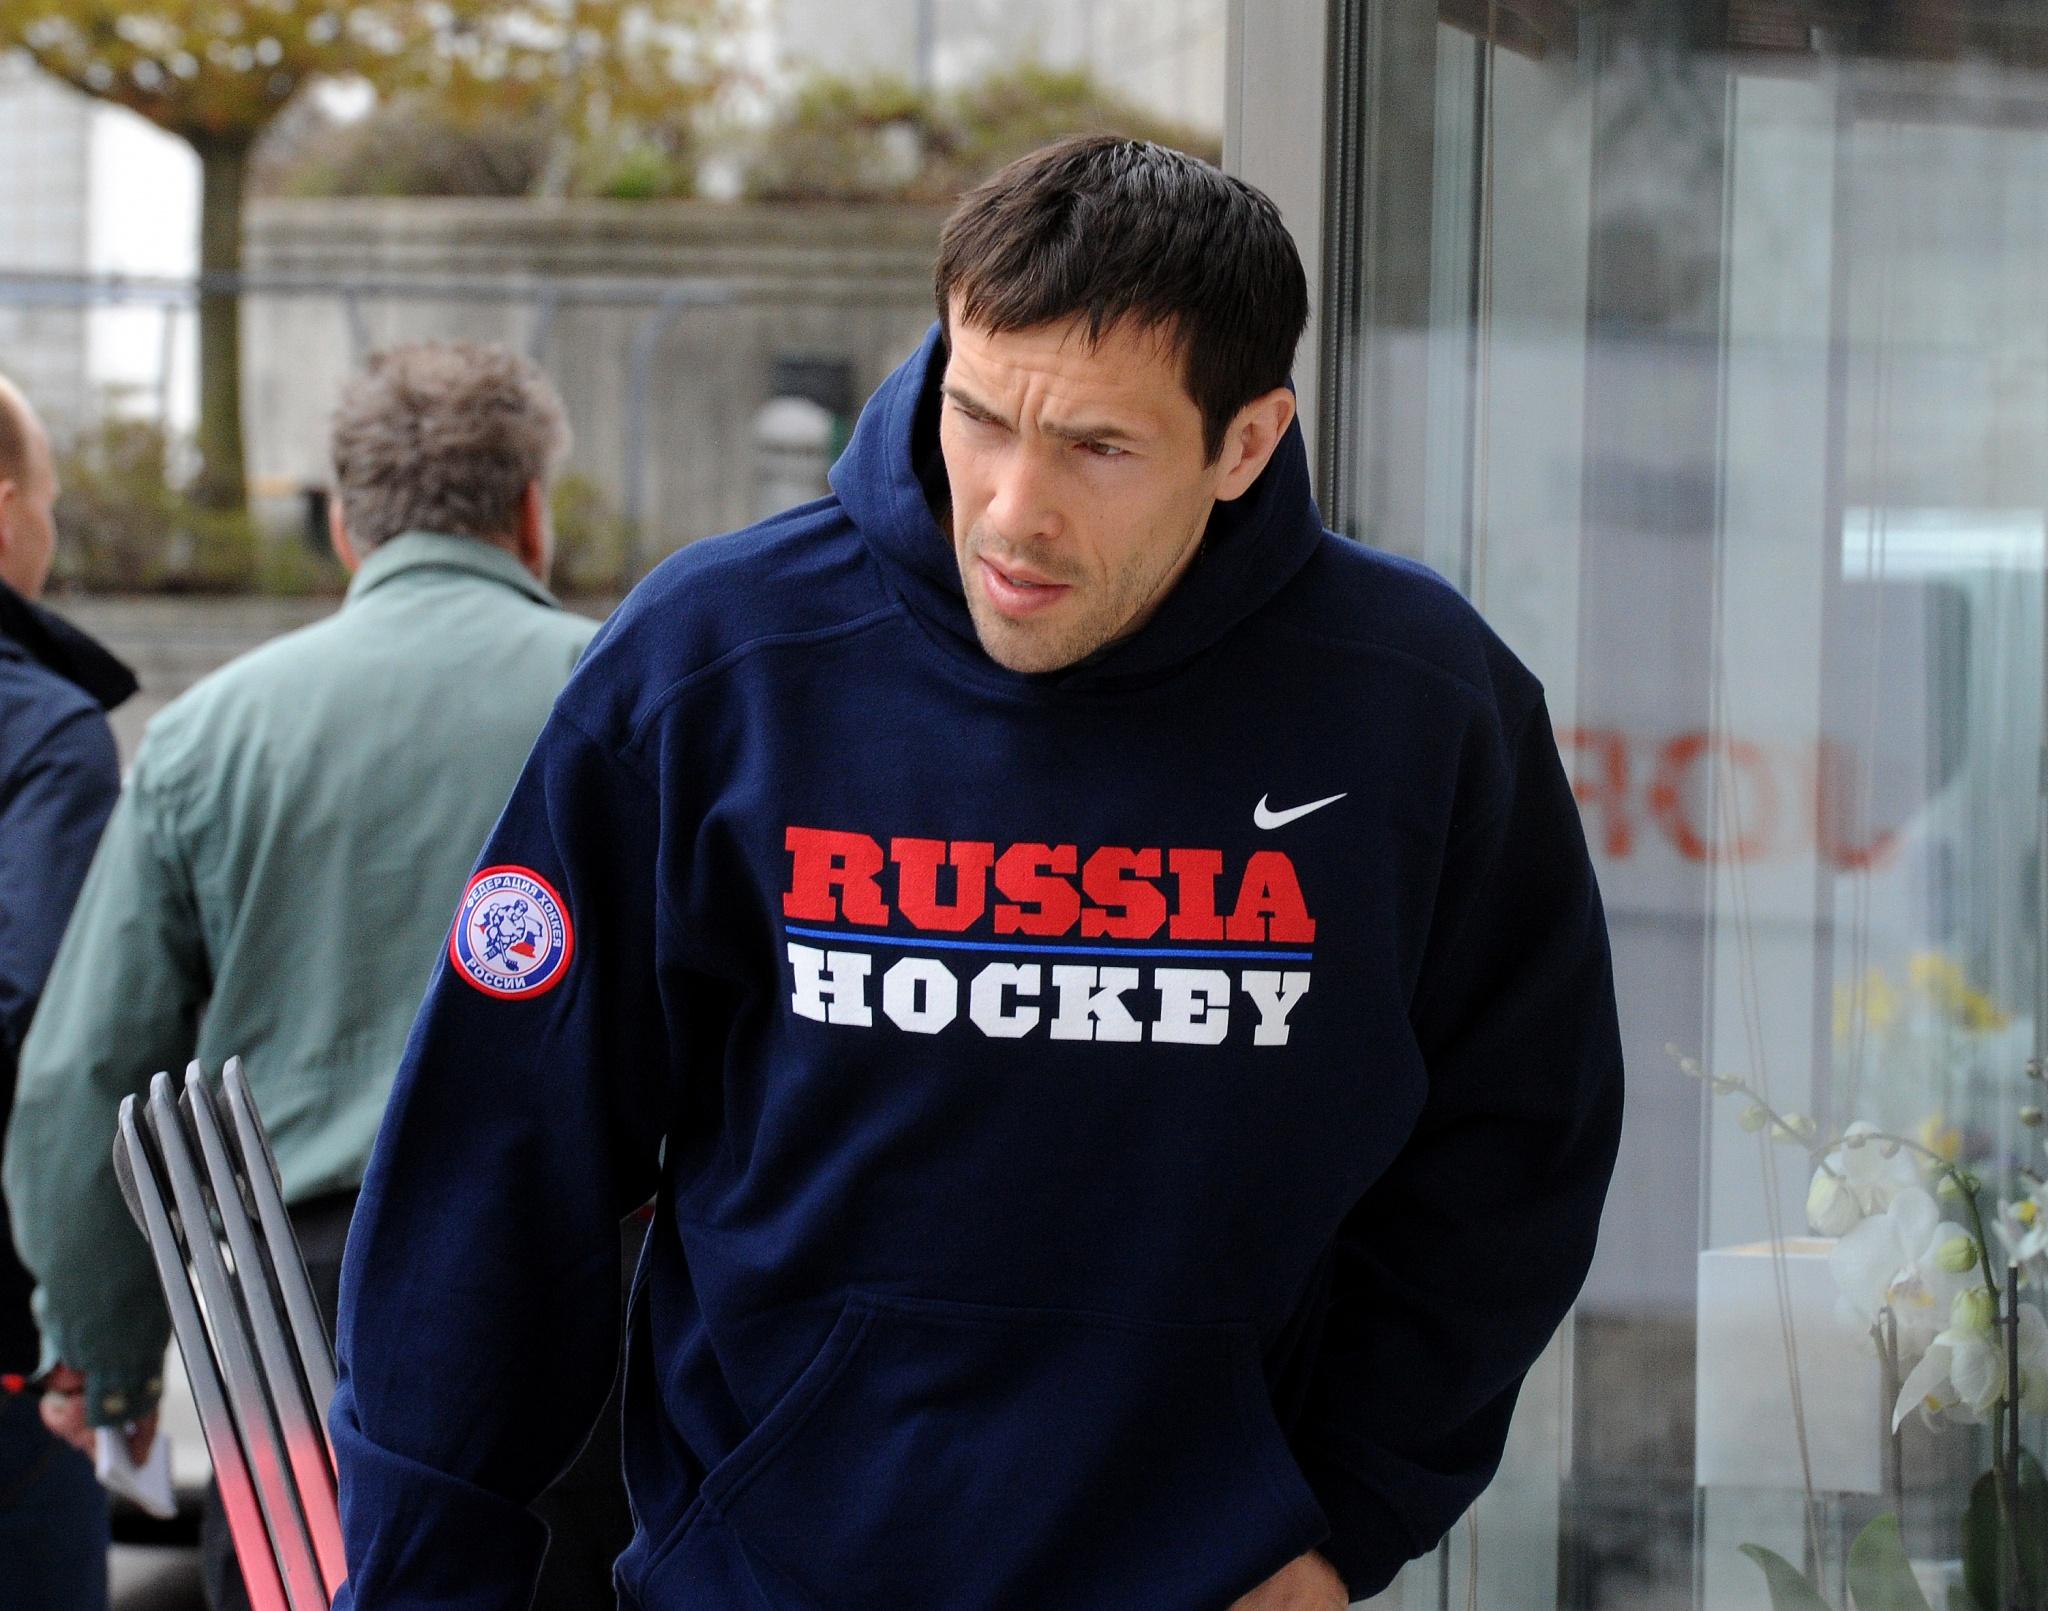 Павел Дацюк. Фото: Владимир Беззубов